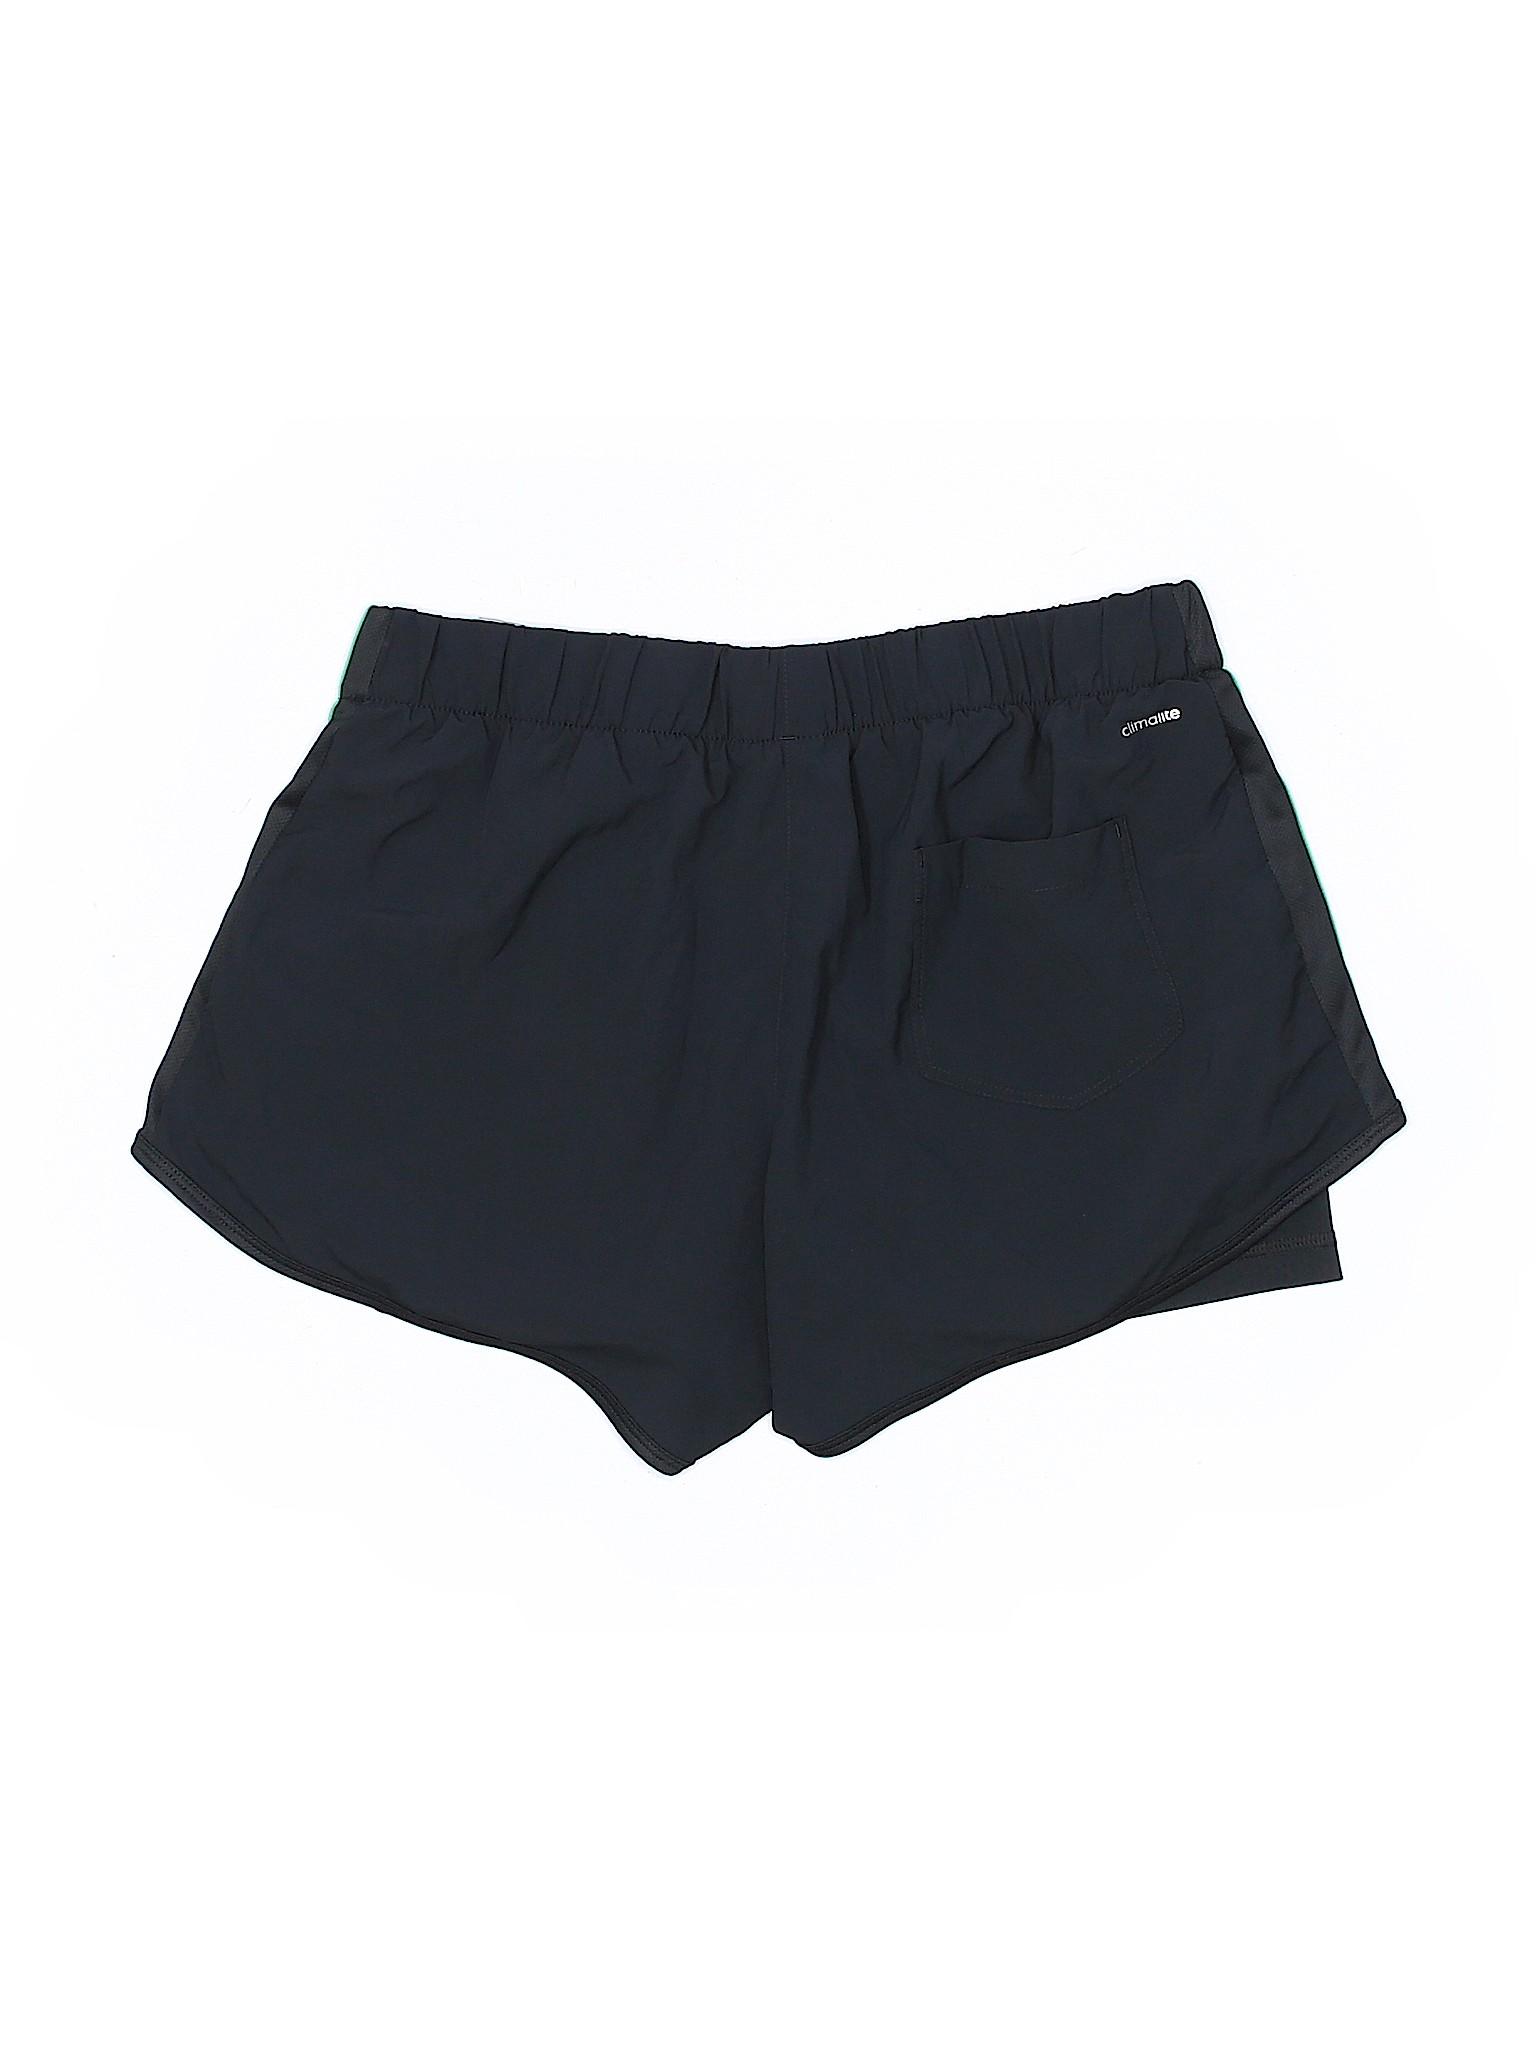 Shorts Boutique Athletic Boutique Adidas Adidas SagwIqn